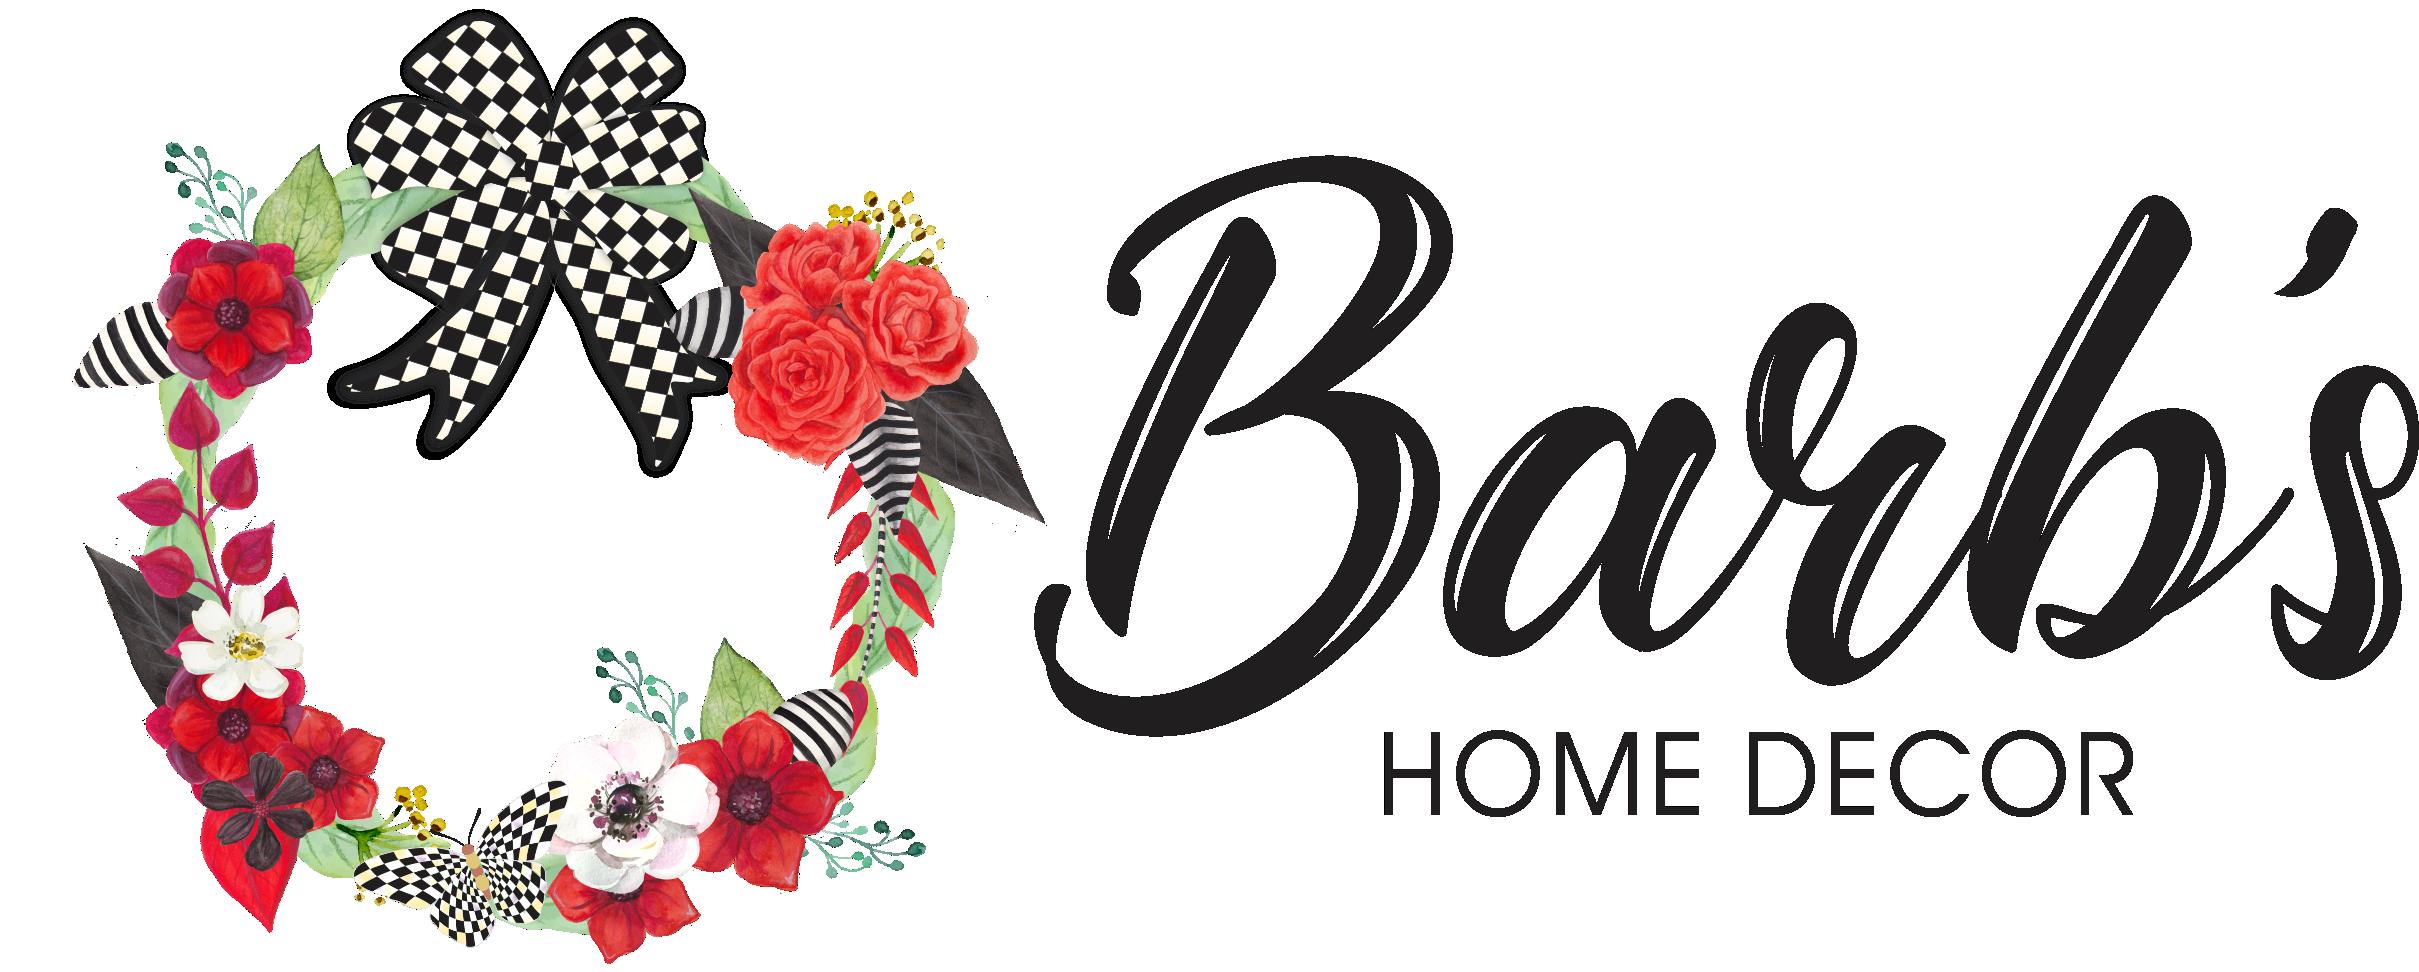 Barbs Home Decor--Special, handmade Wreaths for everyone